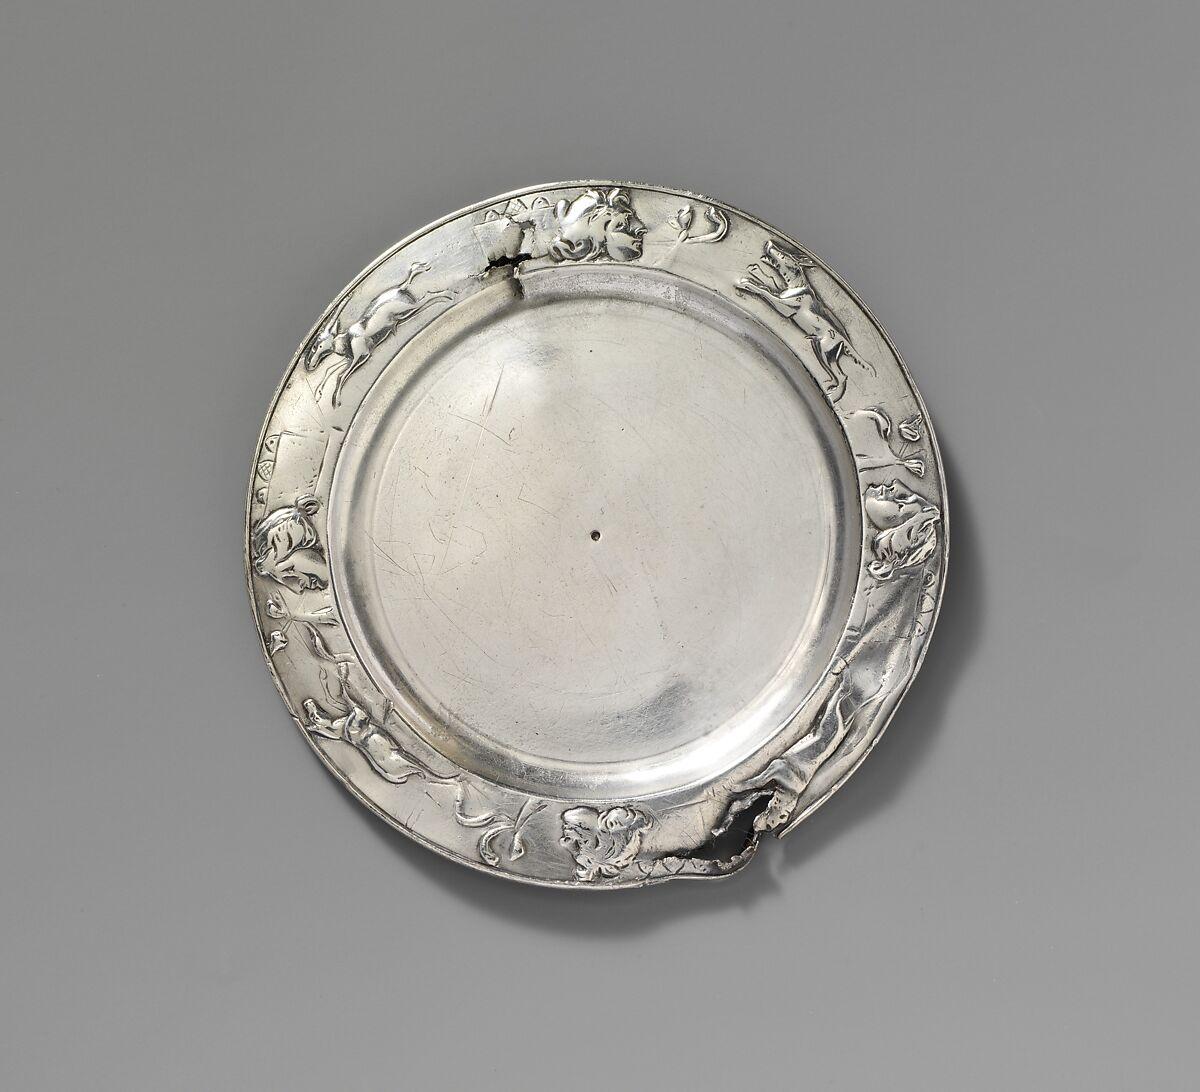 Silver Plate Roman Imperial The Metropolitan Museum Of Art